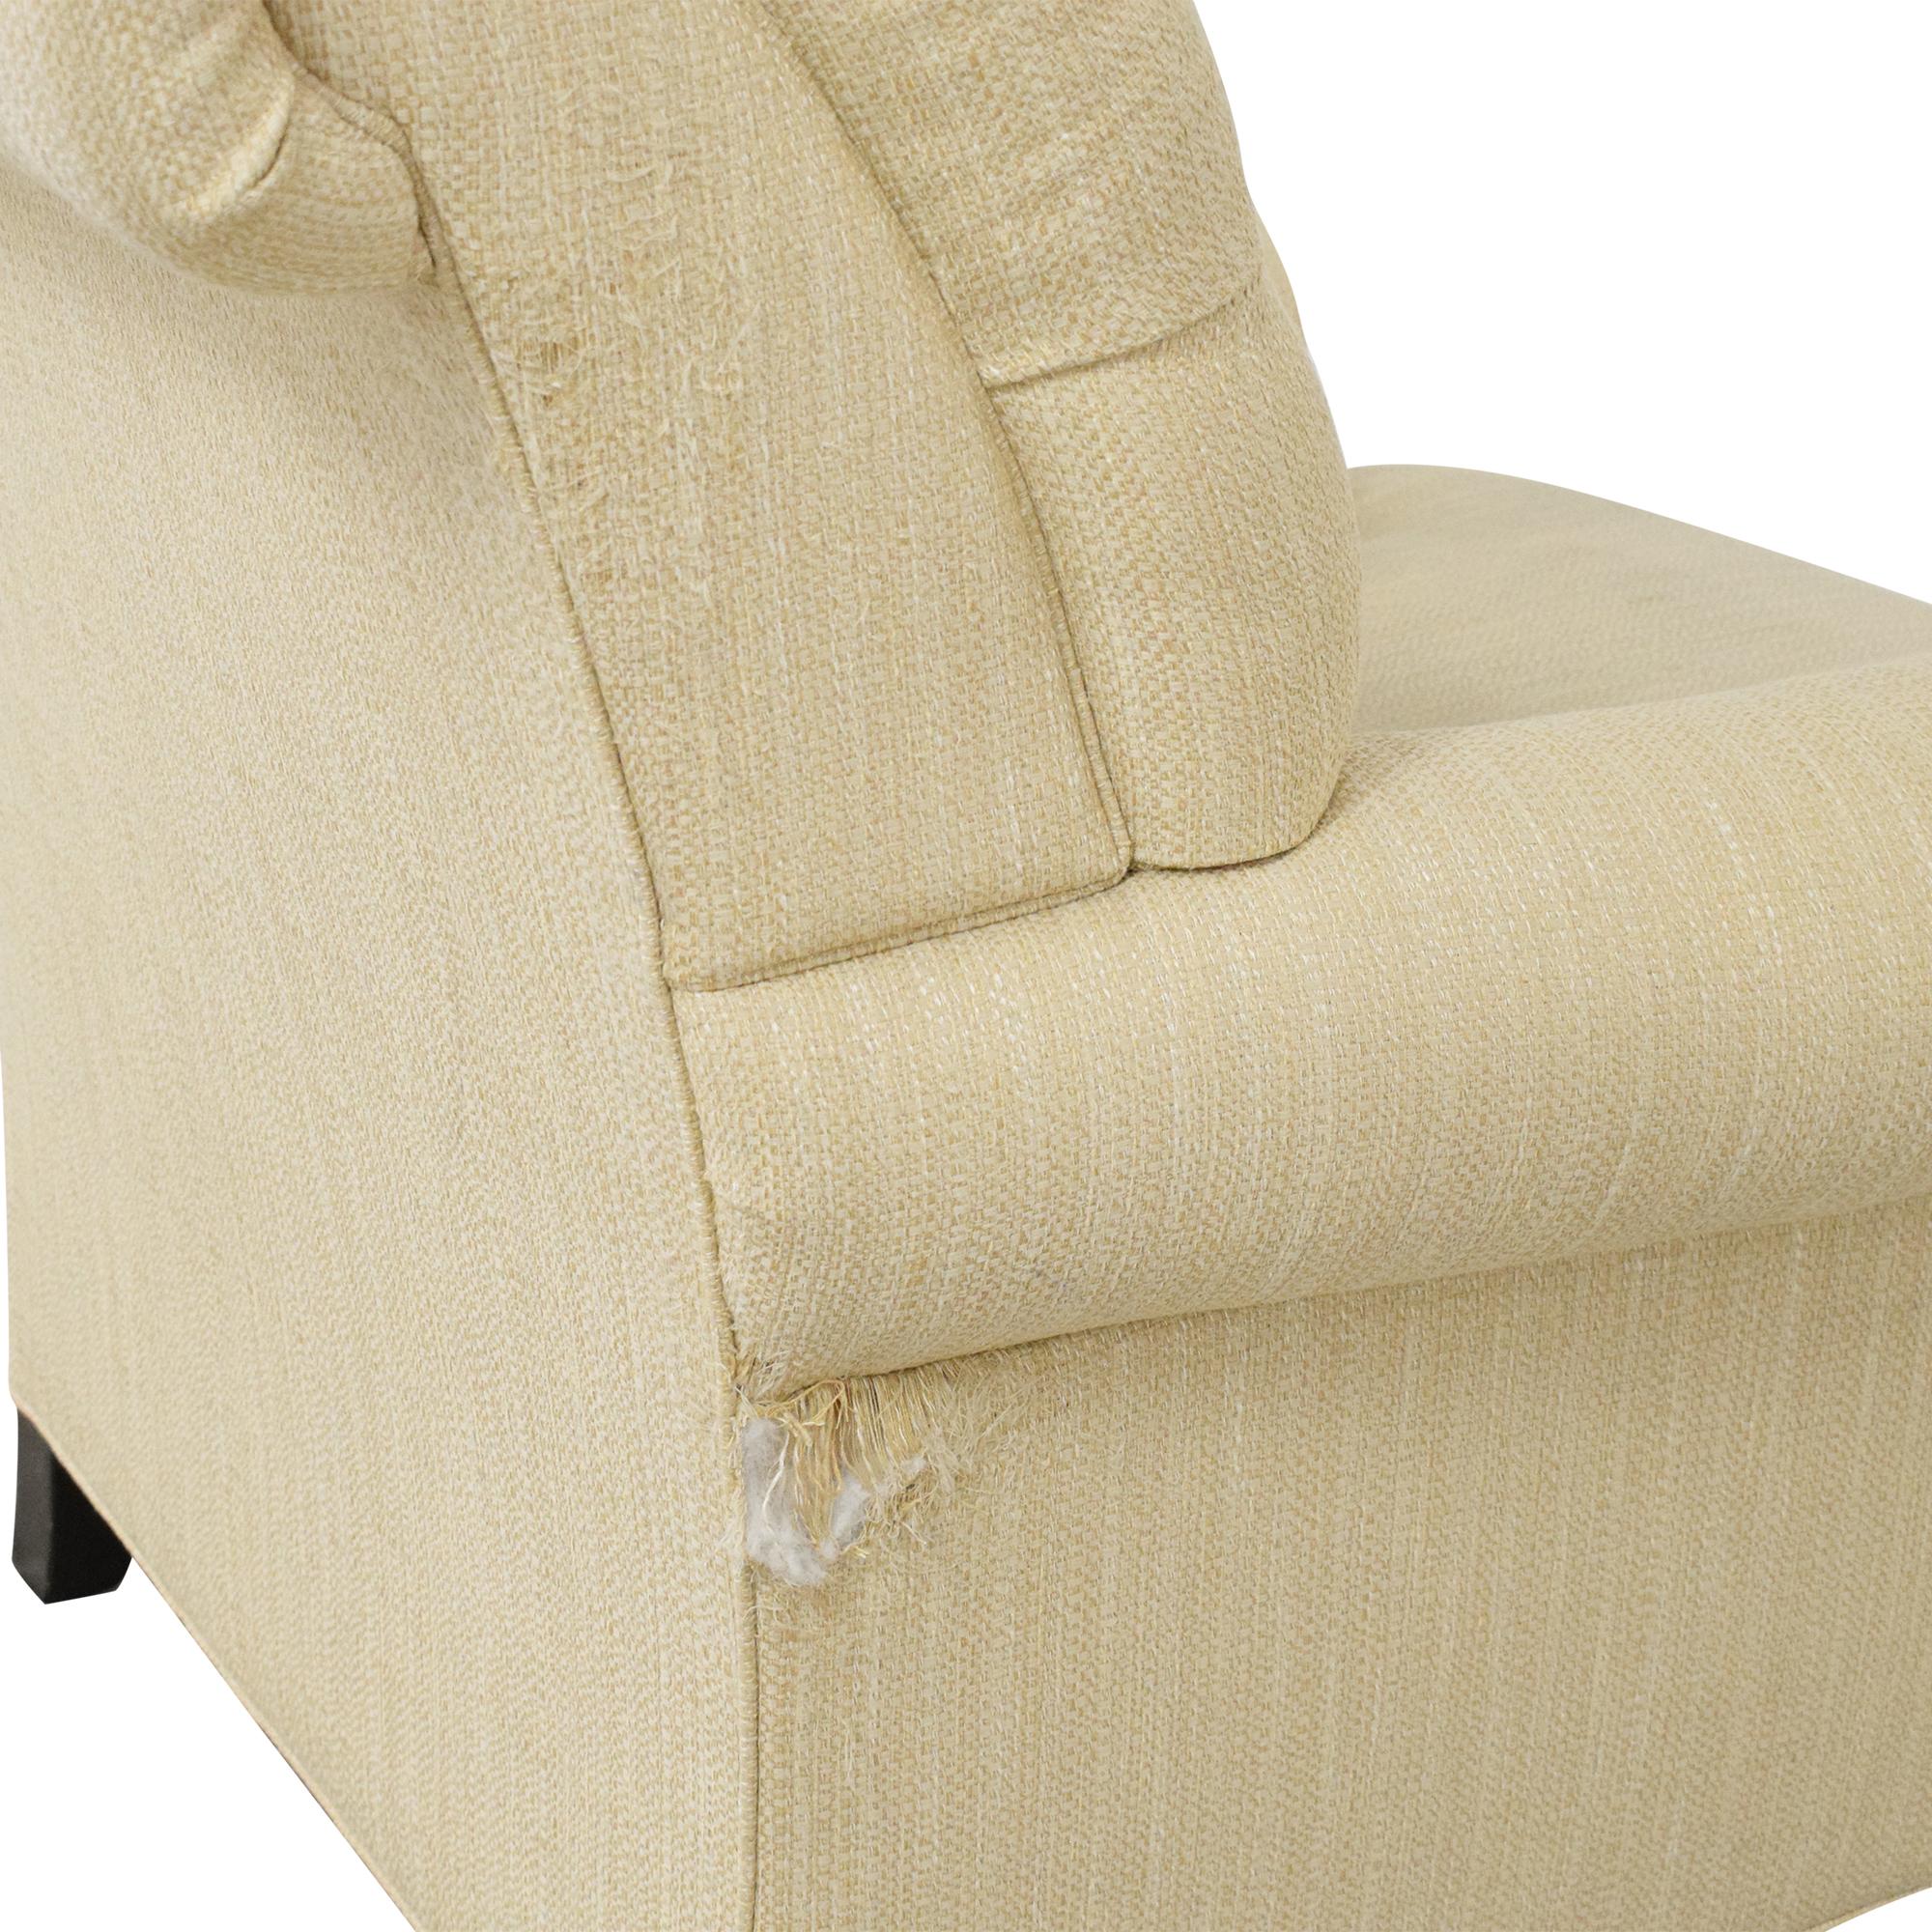 Ethan Allen Shawe Chair / Chairs